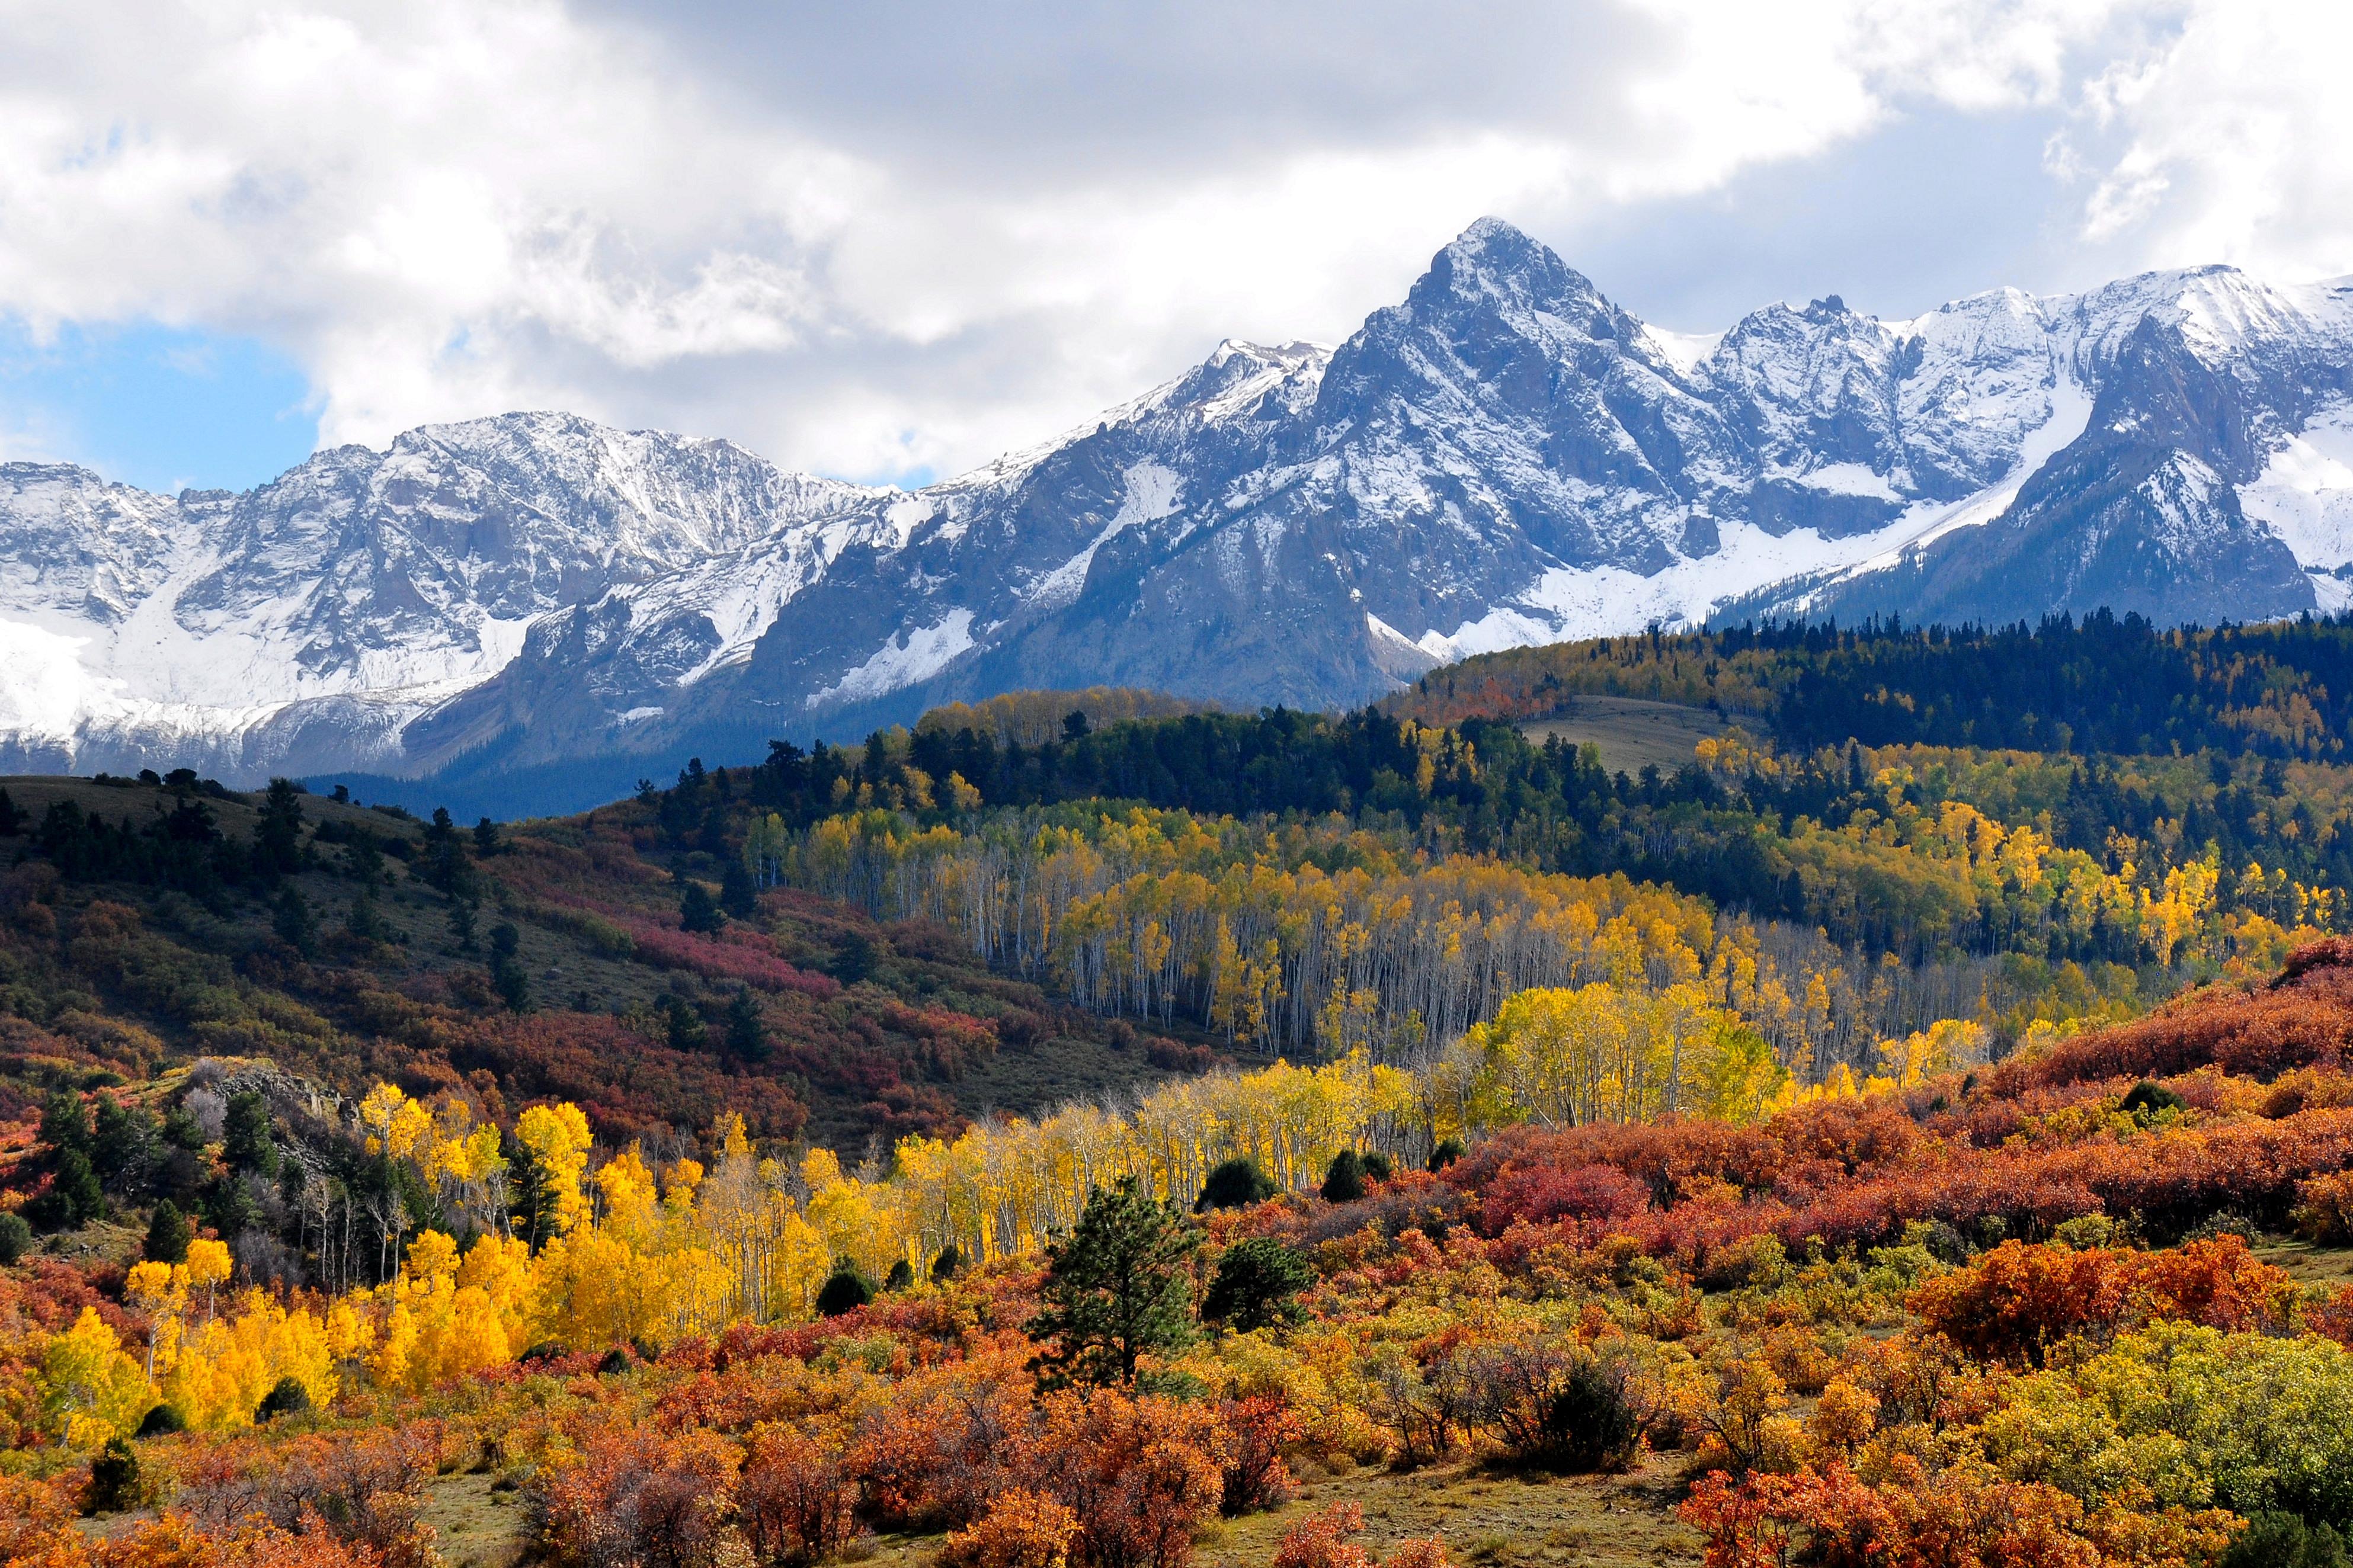 Fall colors near Ridgway Colorado